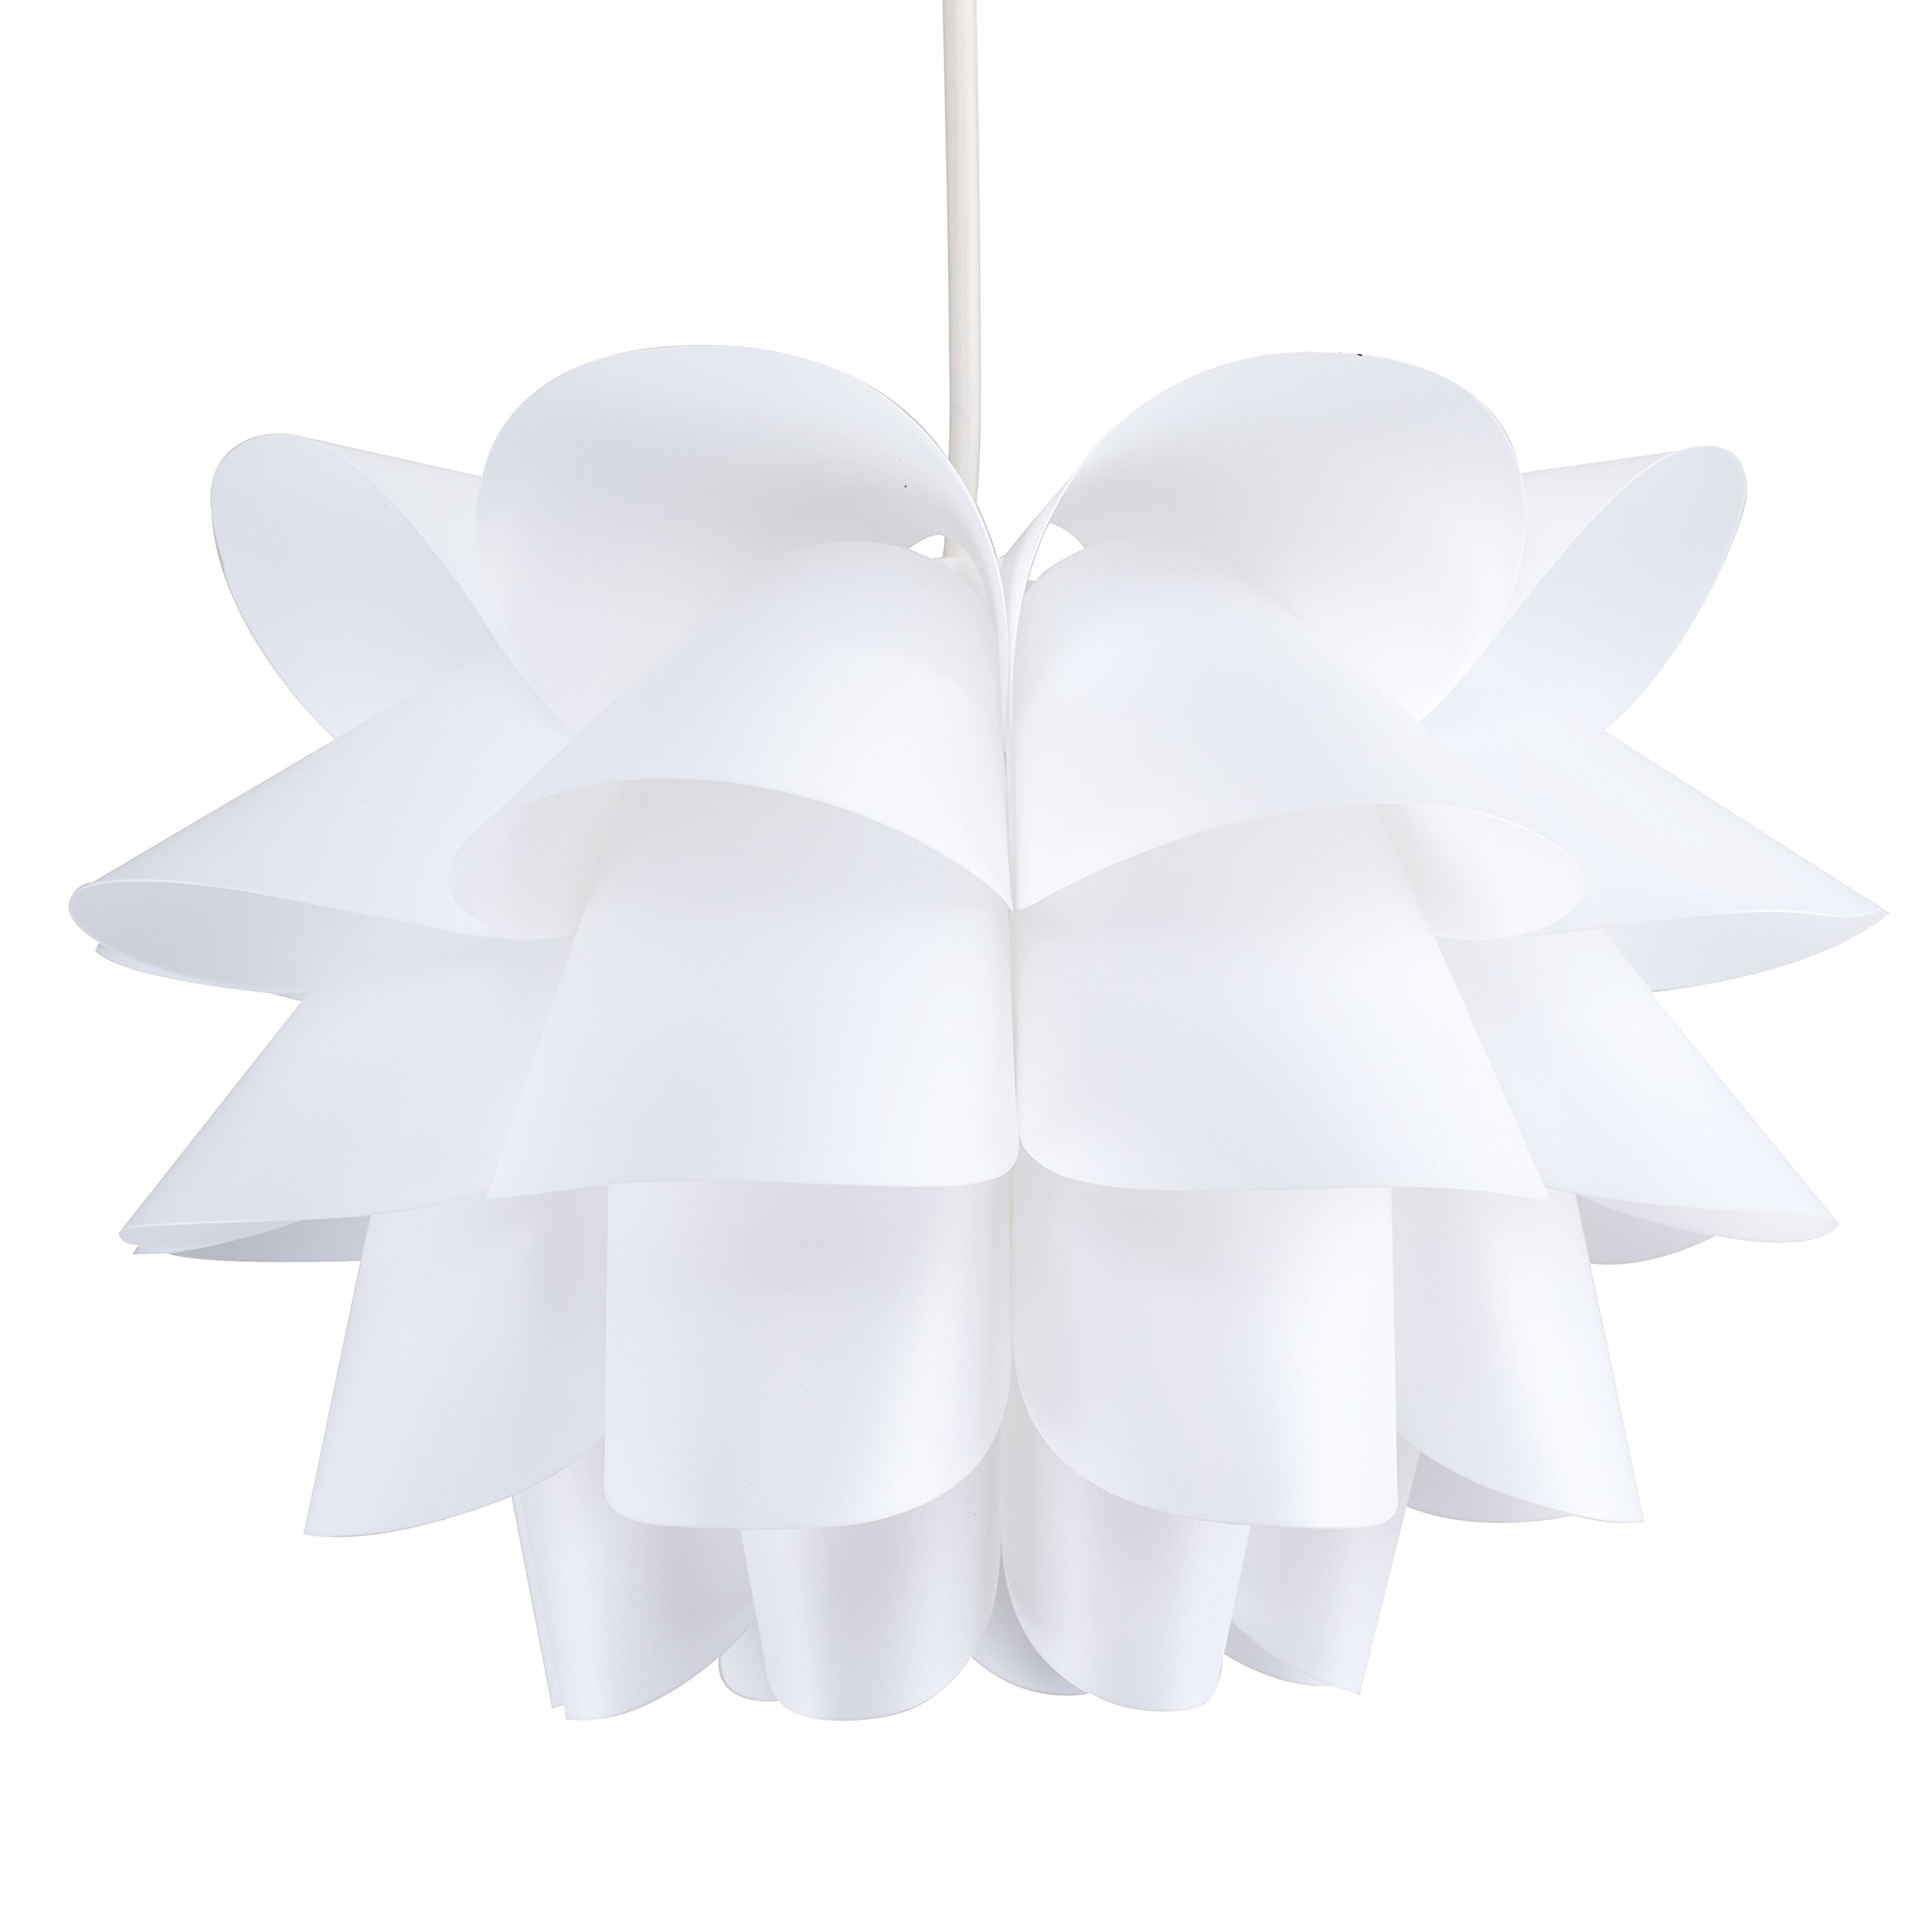 modern lighting shades. Modern Intricate Design White Ceiling Pendant Light Shade Lighting Shades